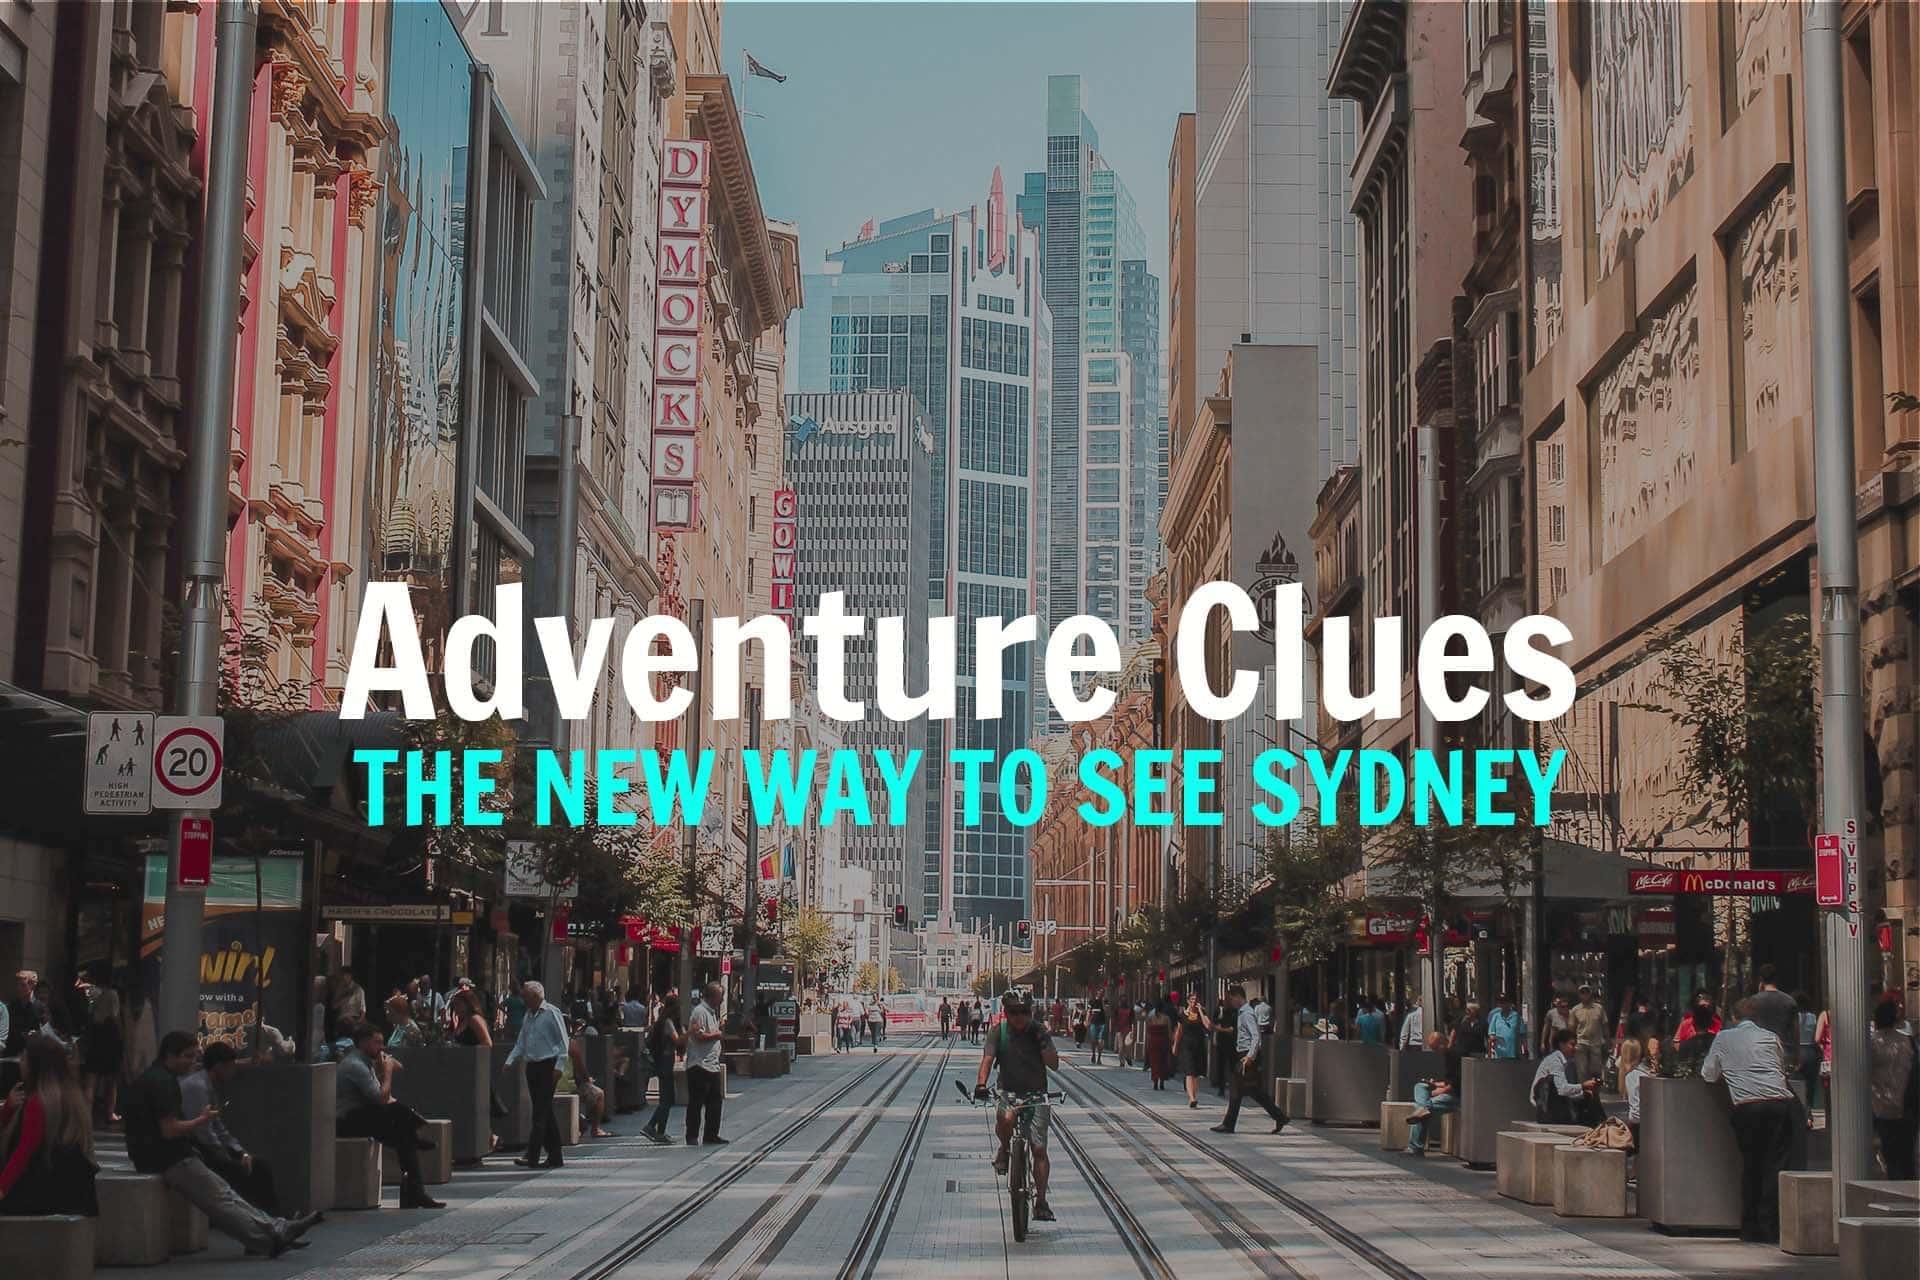 ADVENTURE-CLUES-walking-tour-in-sydney